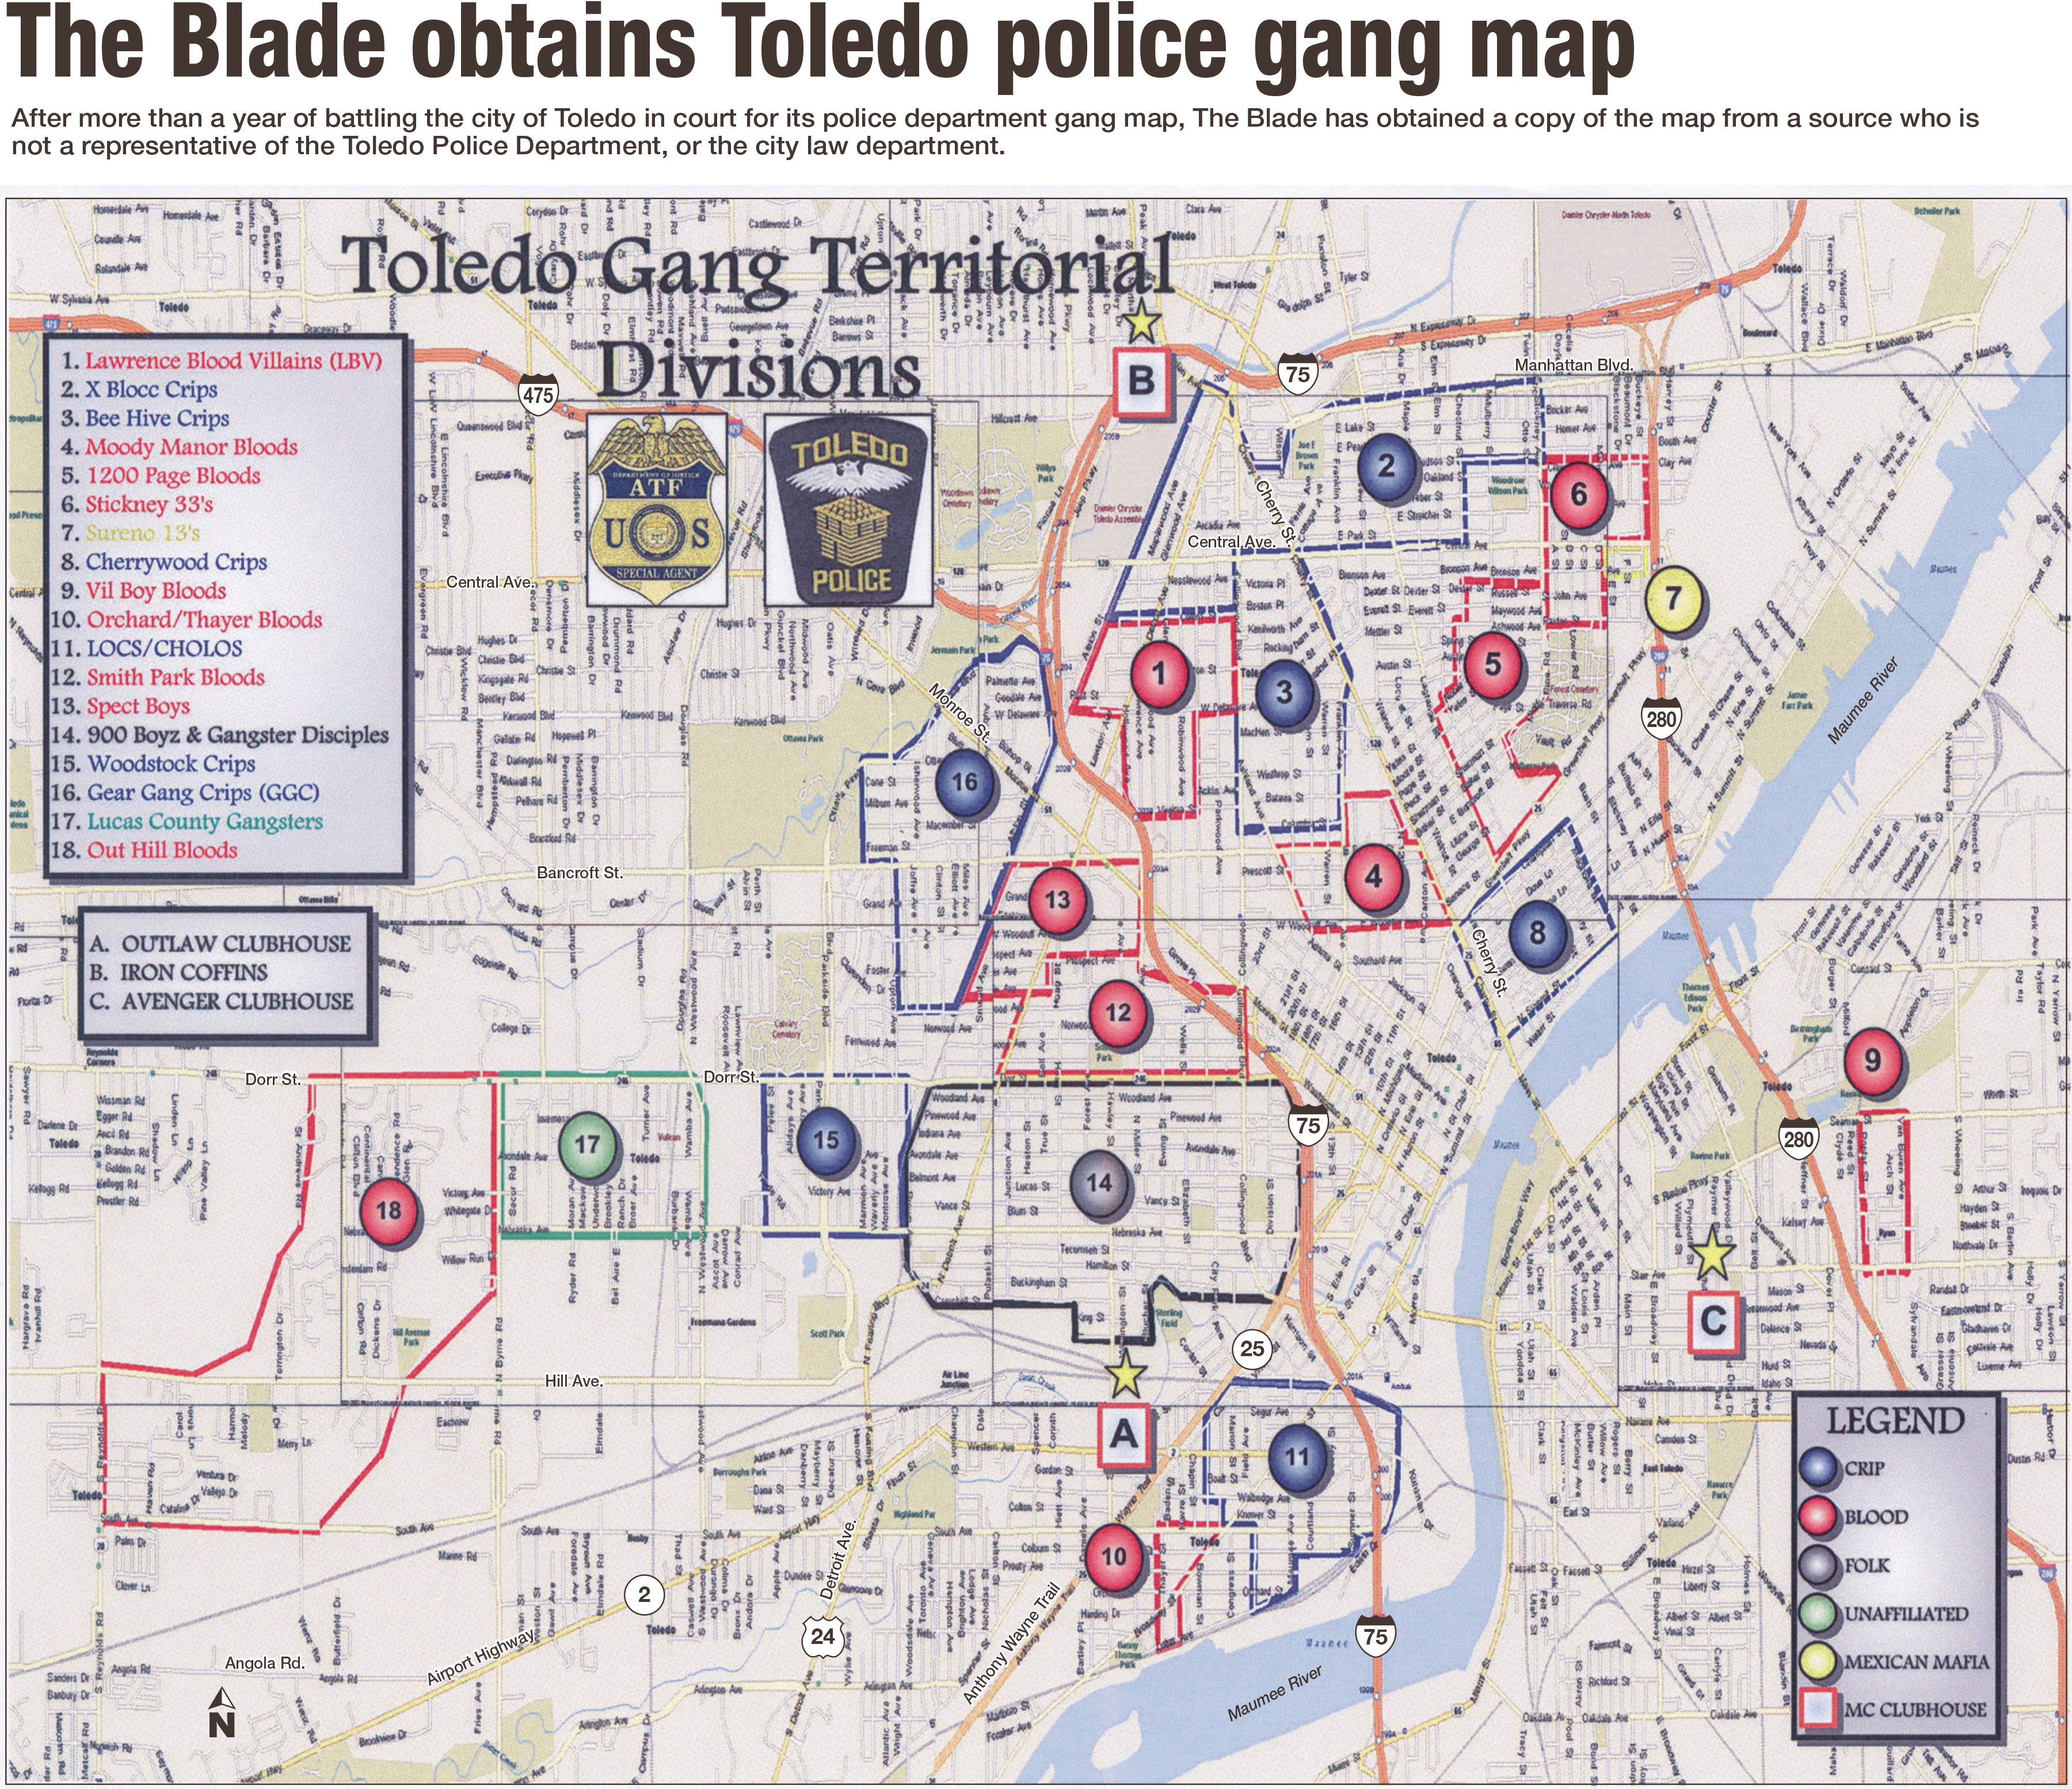 City Map Of Toledo Ohio And Travel Information | Download Free City - Printable Map Of Toledo Ohio